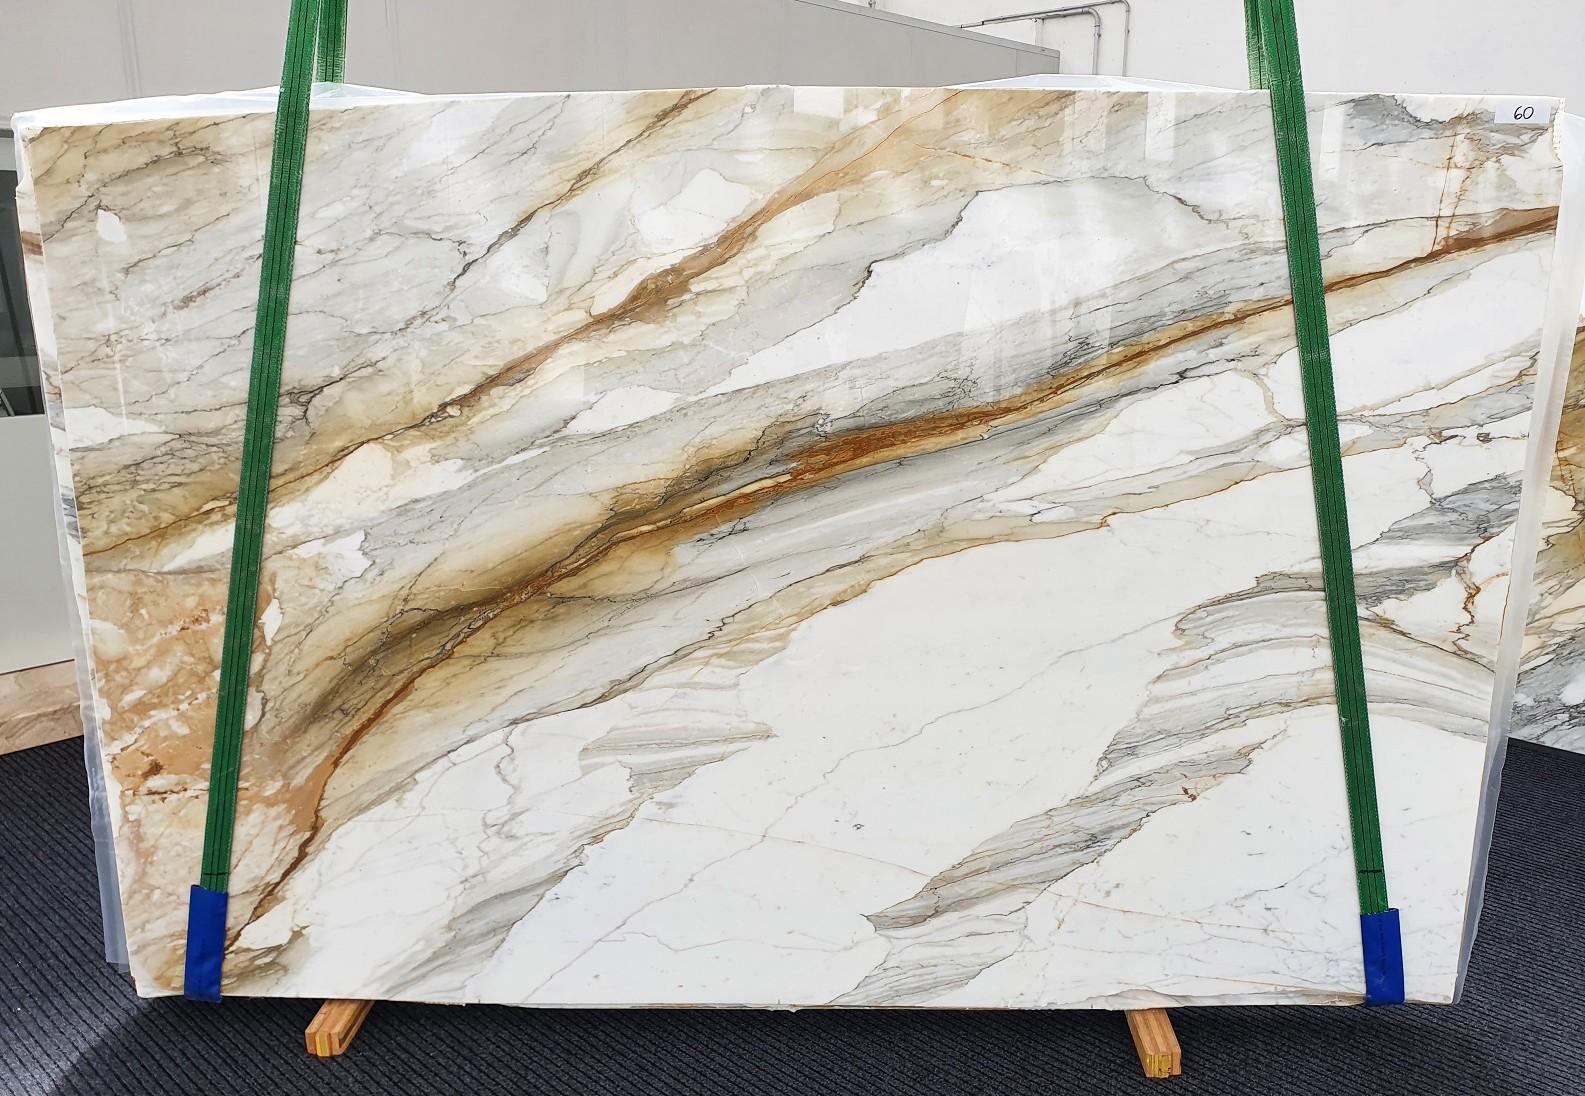 CALACATTA MACCHIAVECCHIA Suministro Veneto (Italia) de planchas pulidas en mármol natural 1354 , Slab #60